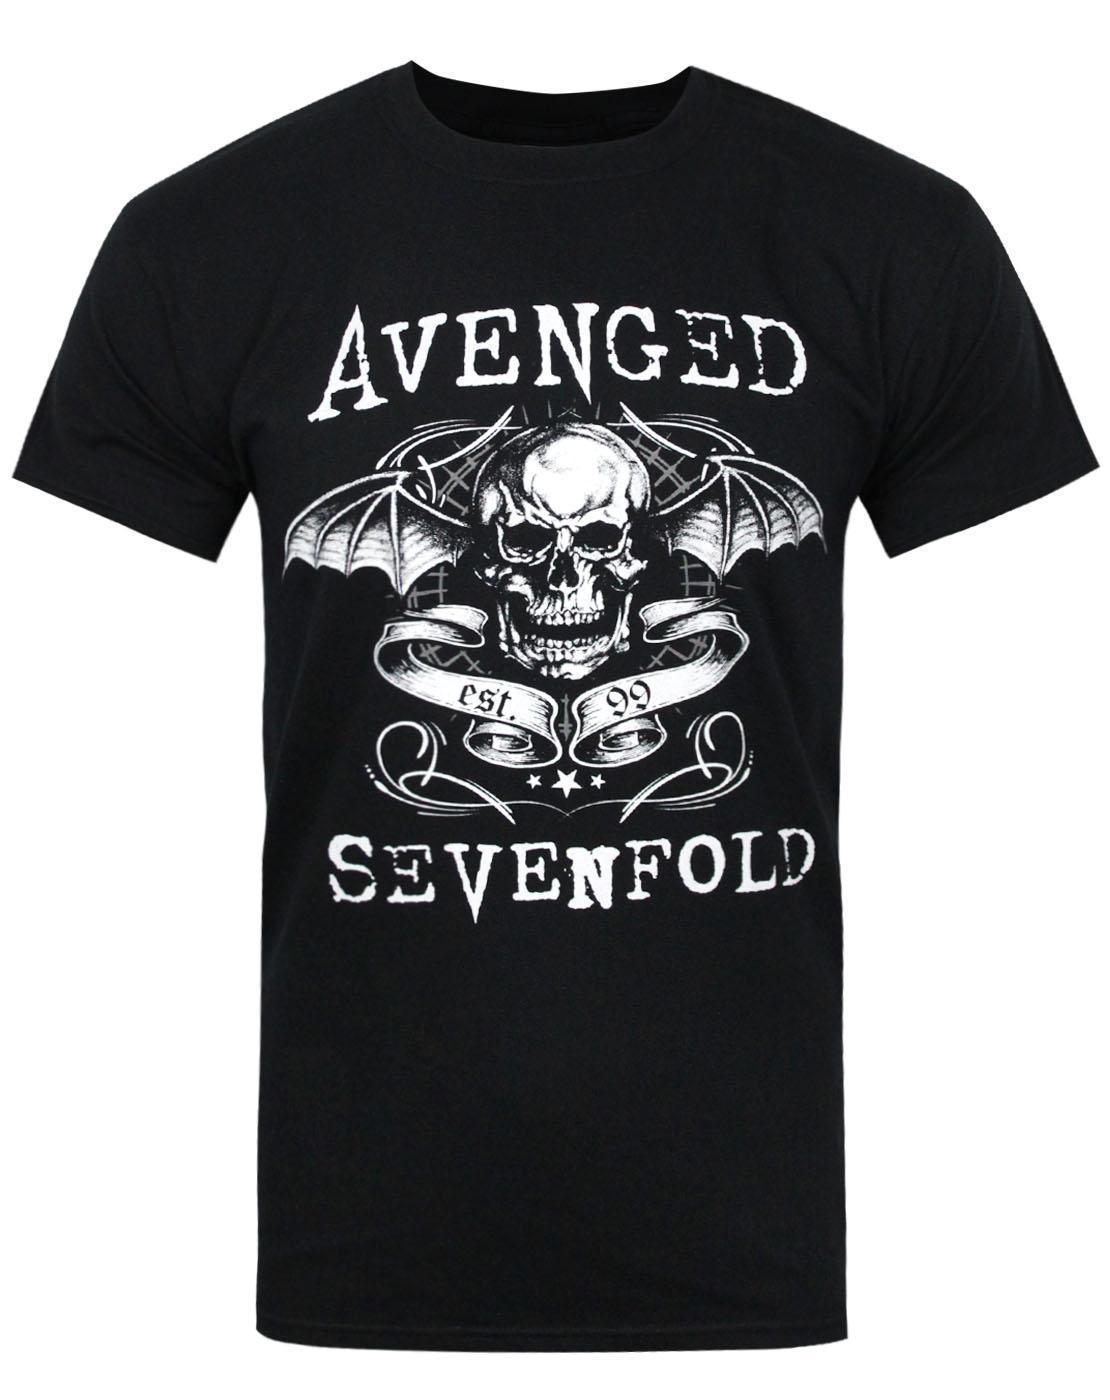 Camiseta oficial Avenged Sevenfold Skull para hombre, camisetas divertidas frescas de verano